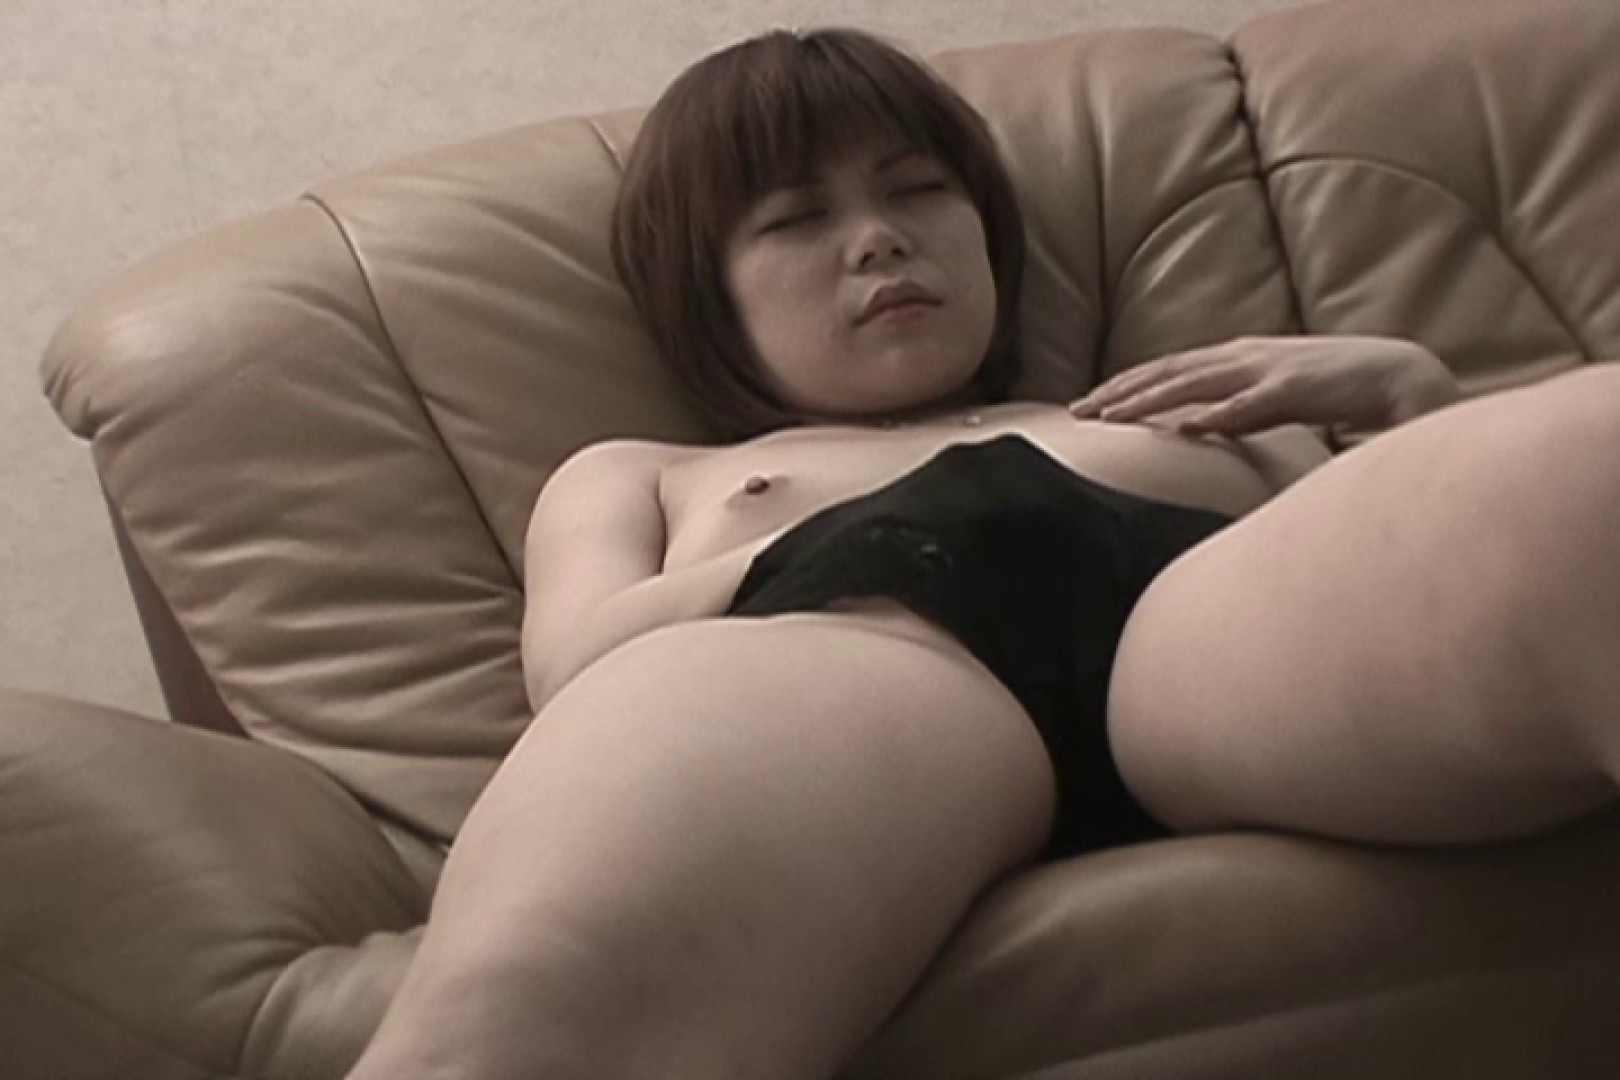 Hするために生まれてきたようなイキまくりの極エロ人妻~小池ゆり~ オナニー映像 オメコ動画キャプチャ 92枚 92